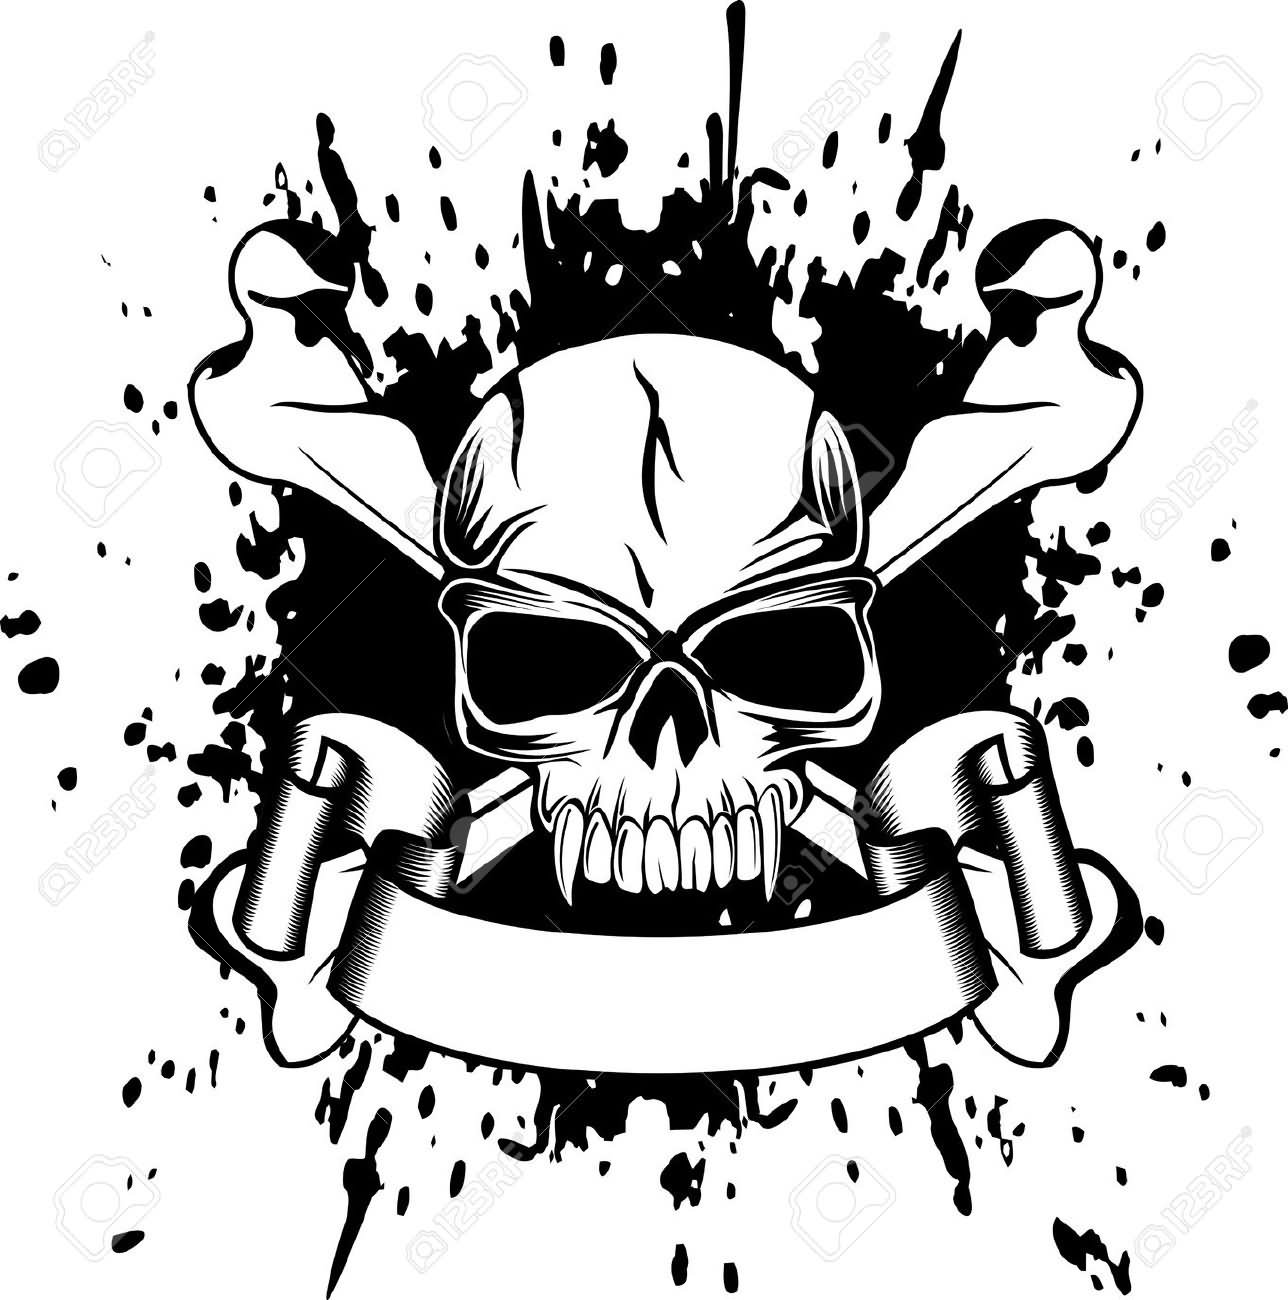 Black Gangster Danger Skull With Ribbon Tattoo Stencil